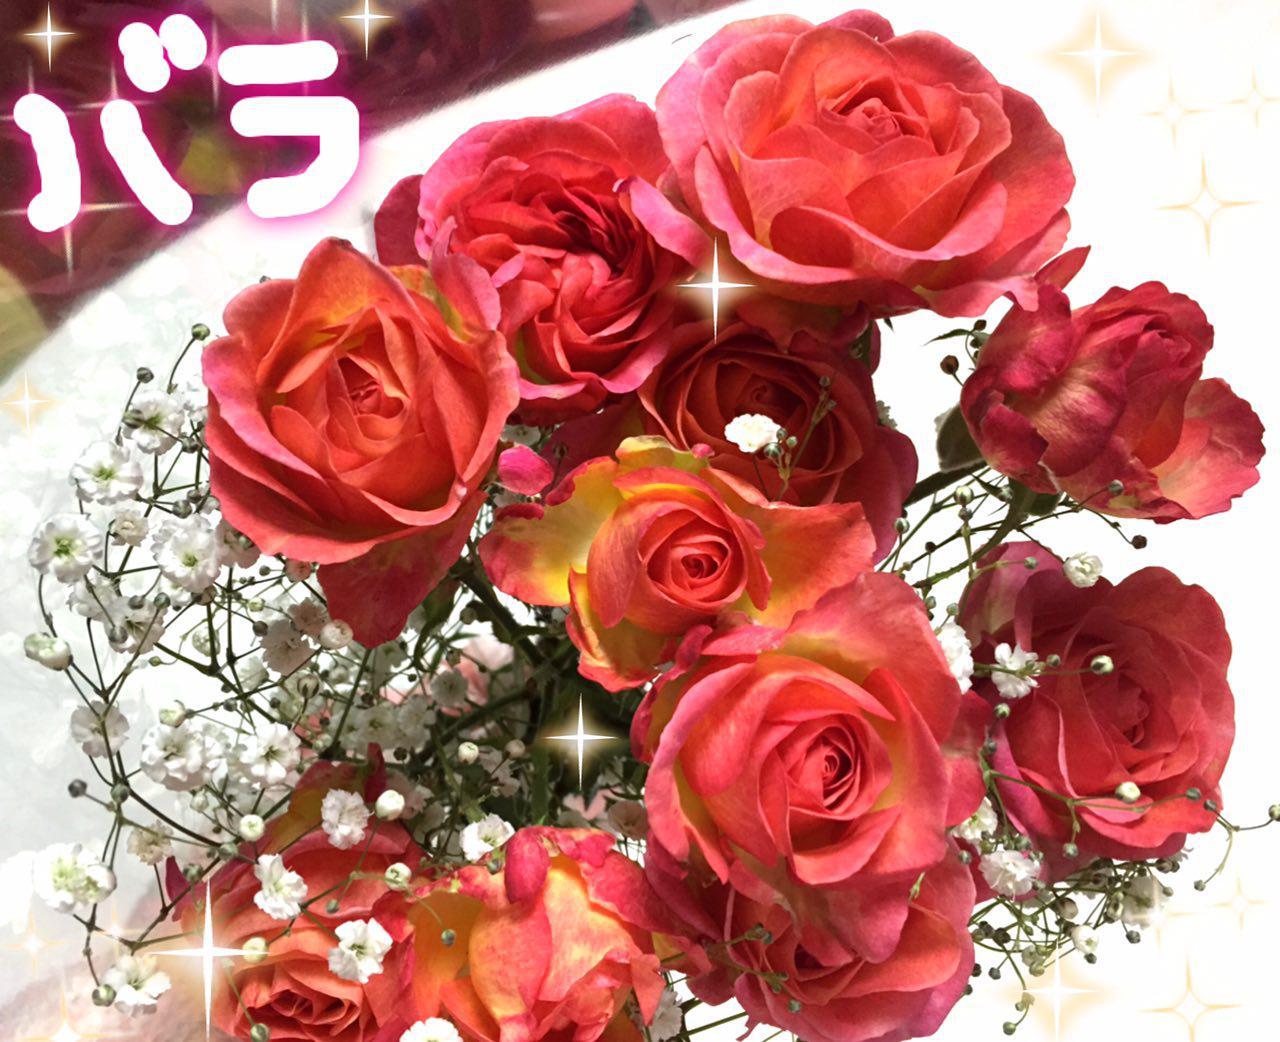 photo_2017-02-19_00-41-29.jpg